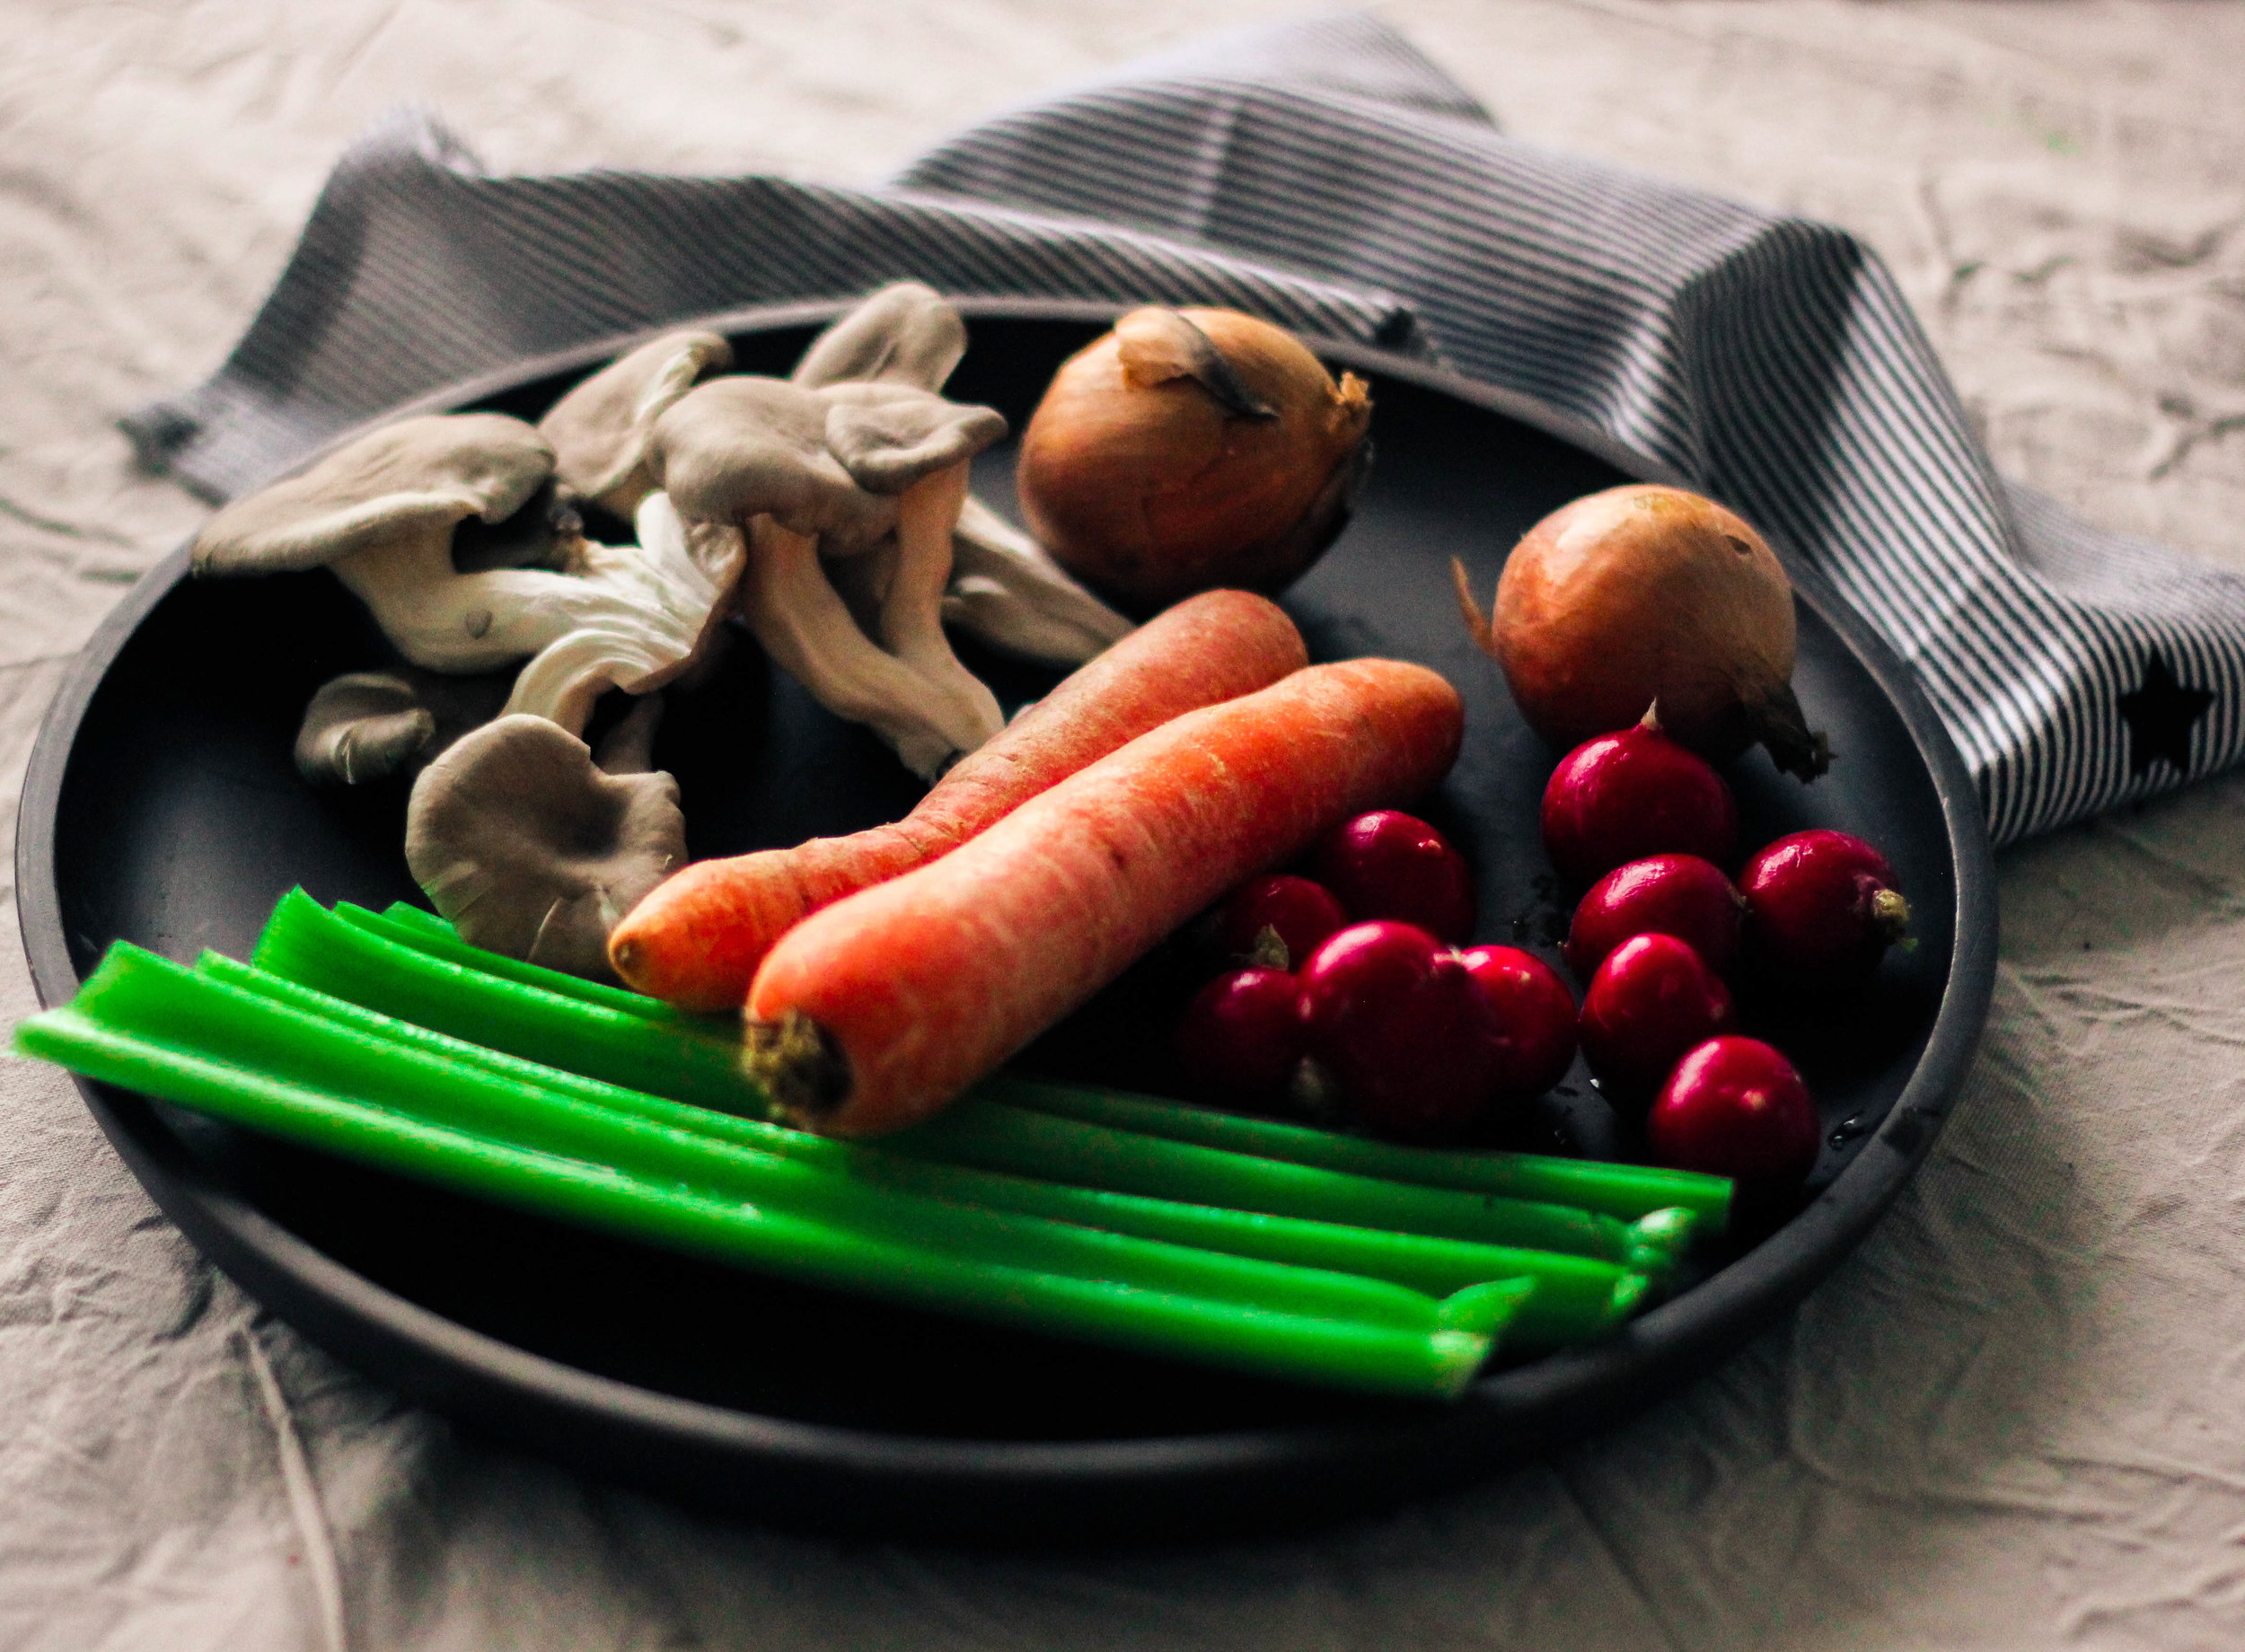 Healthy detox and natural cleanse vegetable broth Photo Linda Haggh.jpg